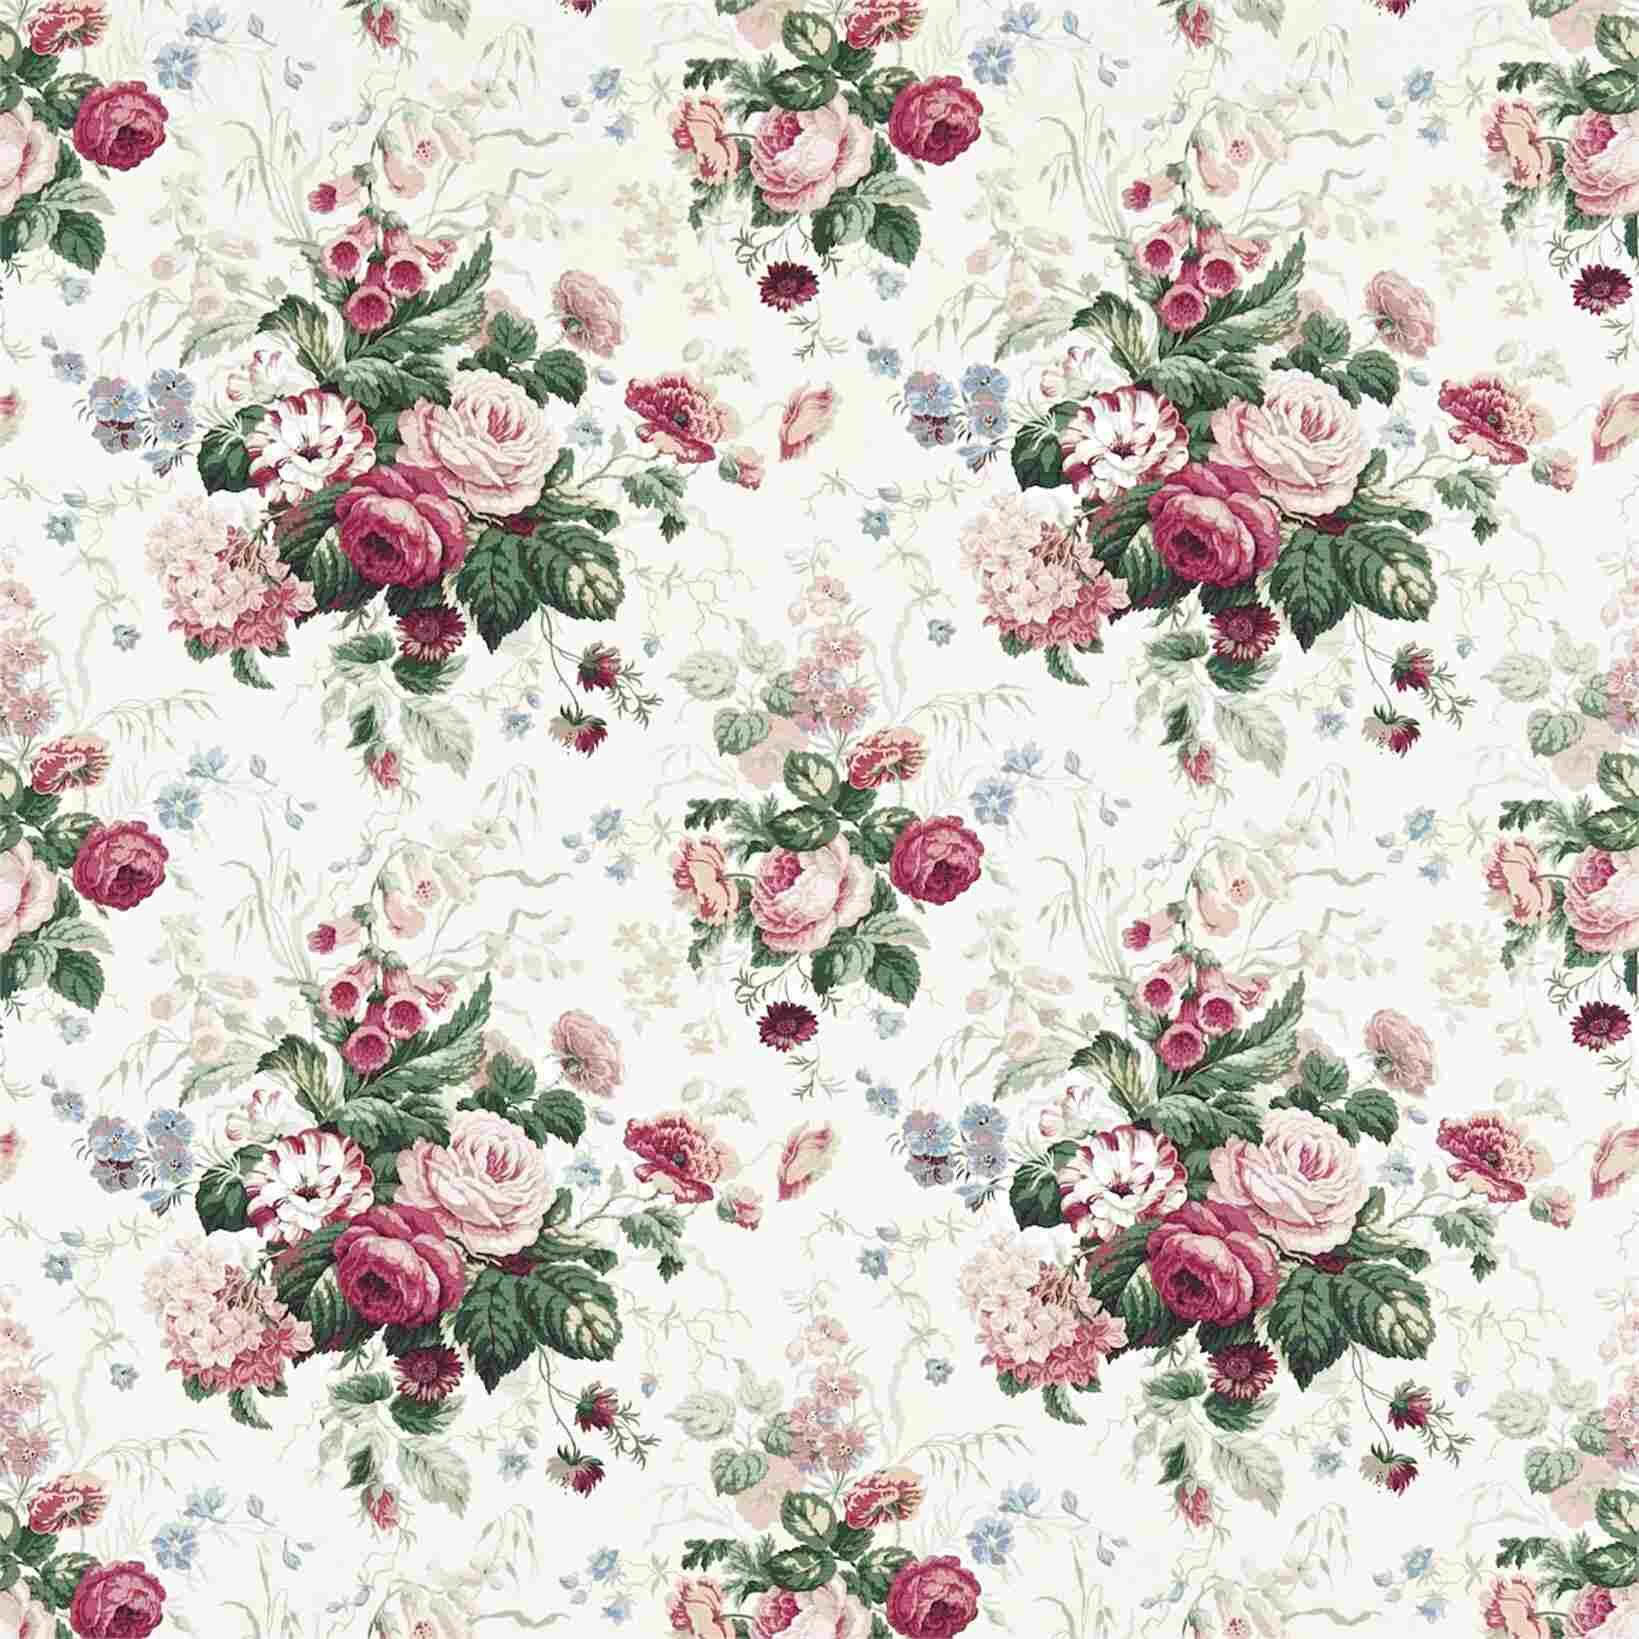 sanderson floral fabric for sale